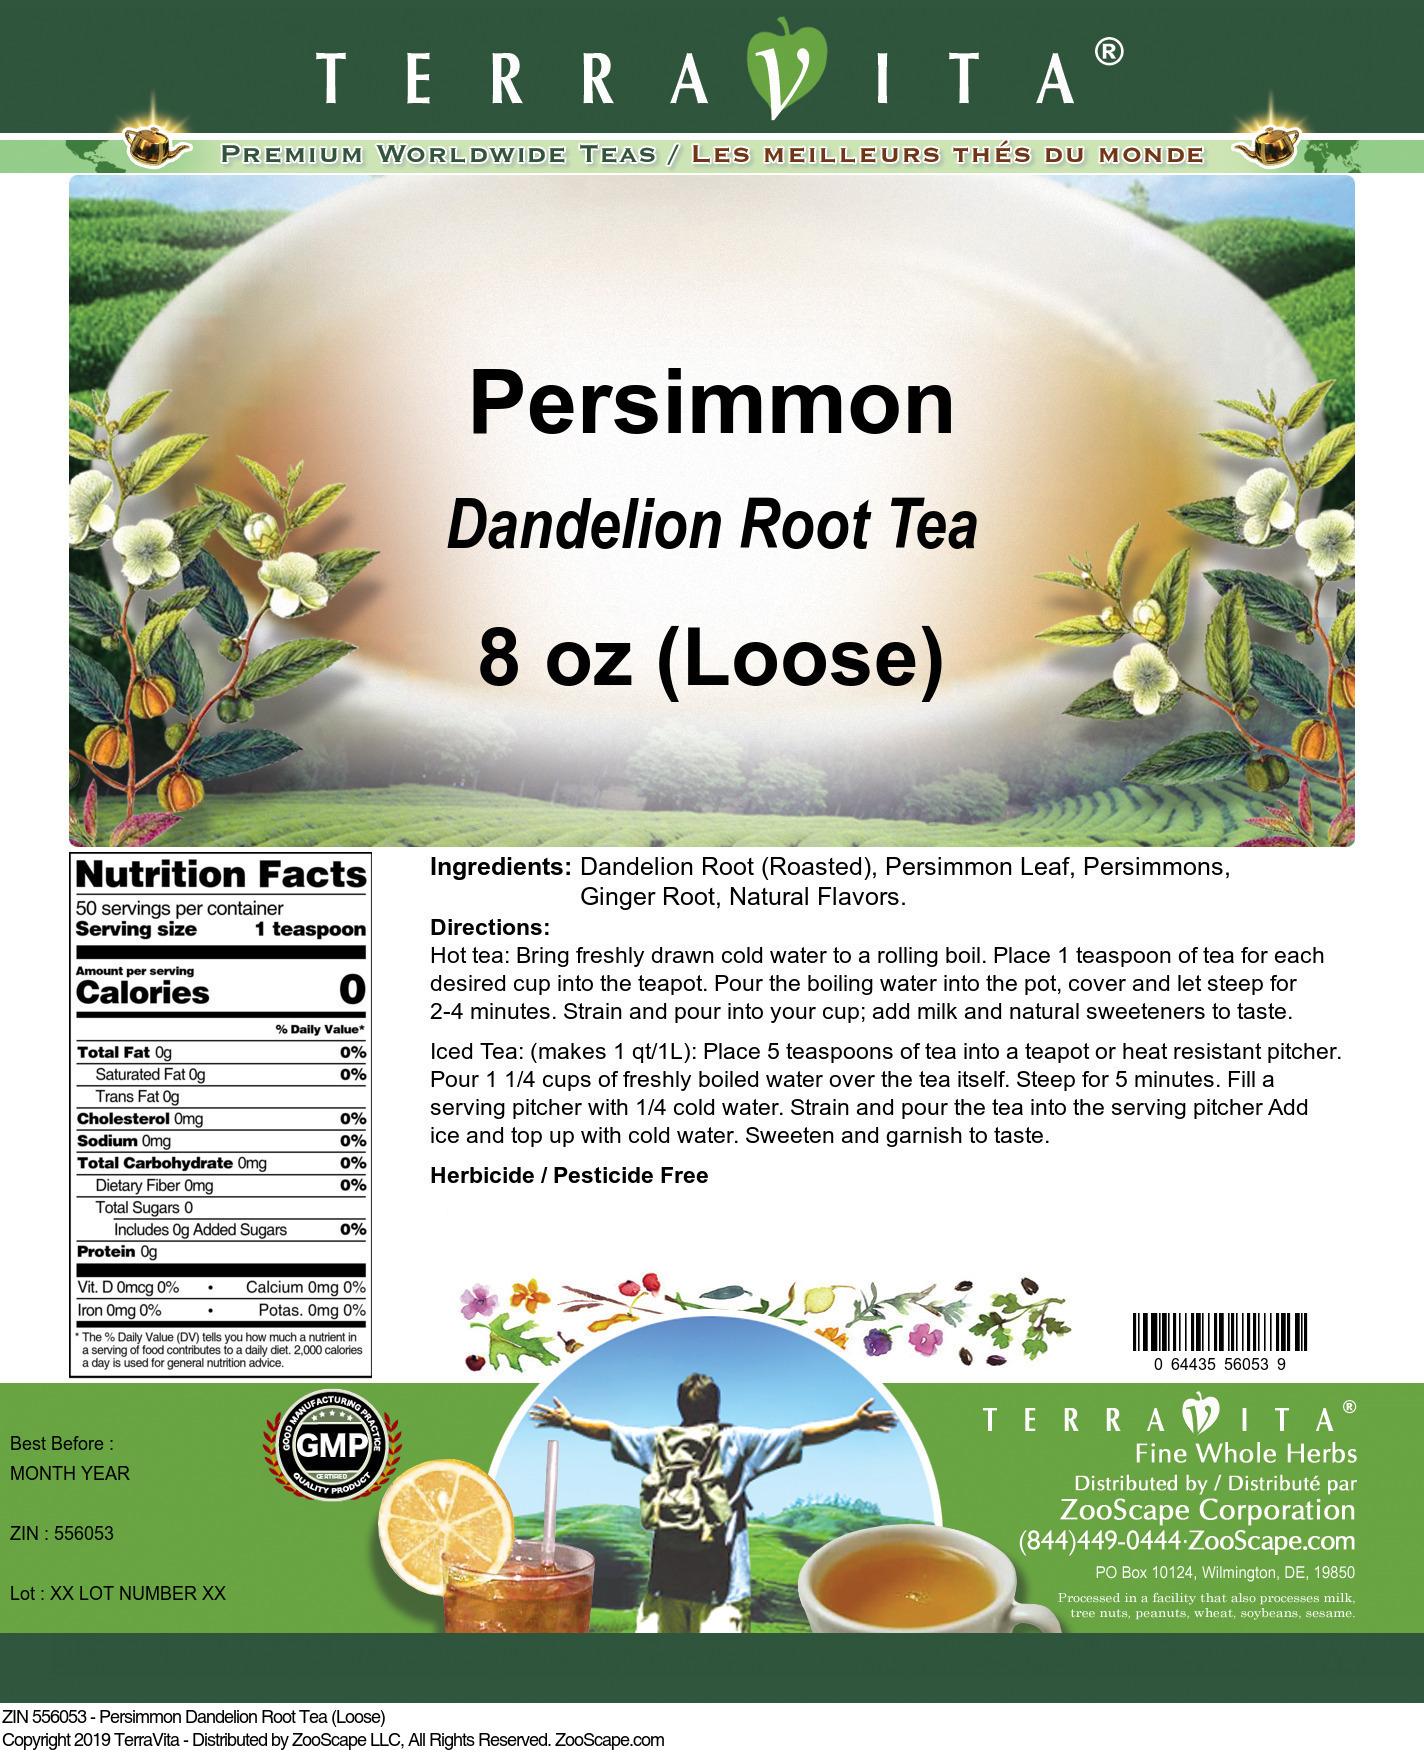 Persimmon Dandelion Root Tea (Loose)